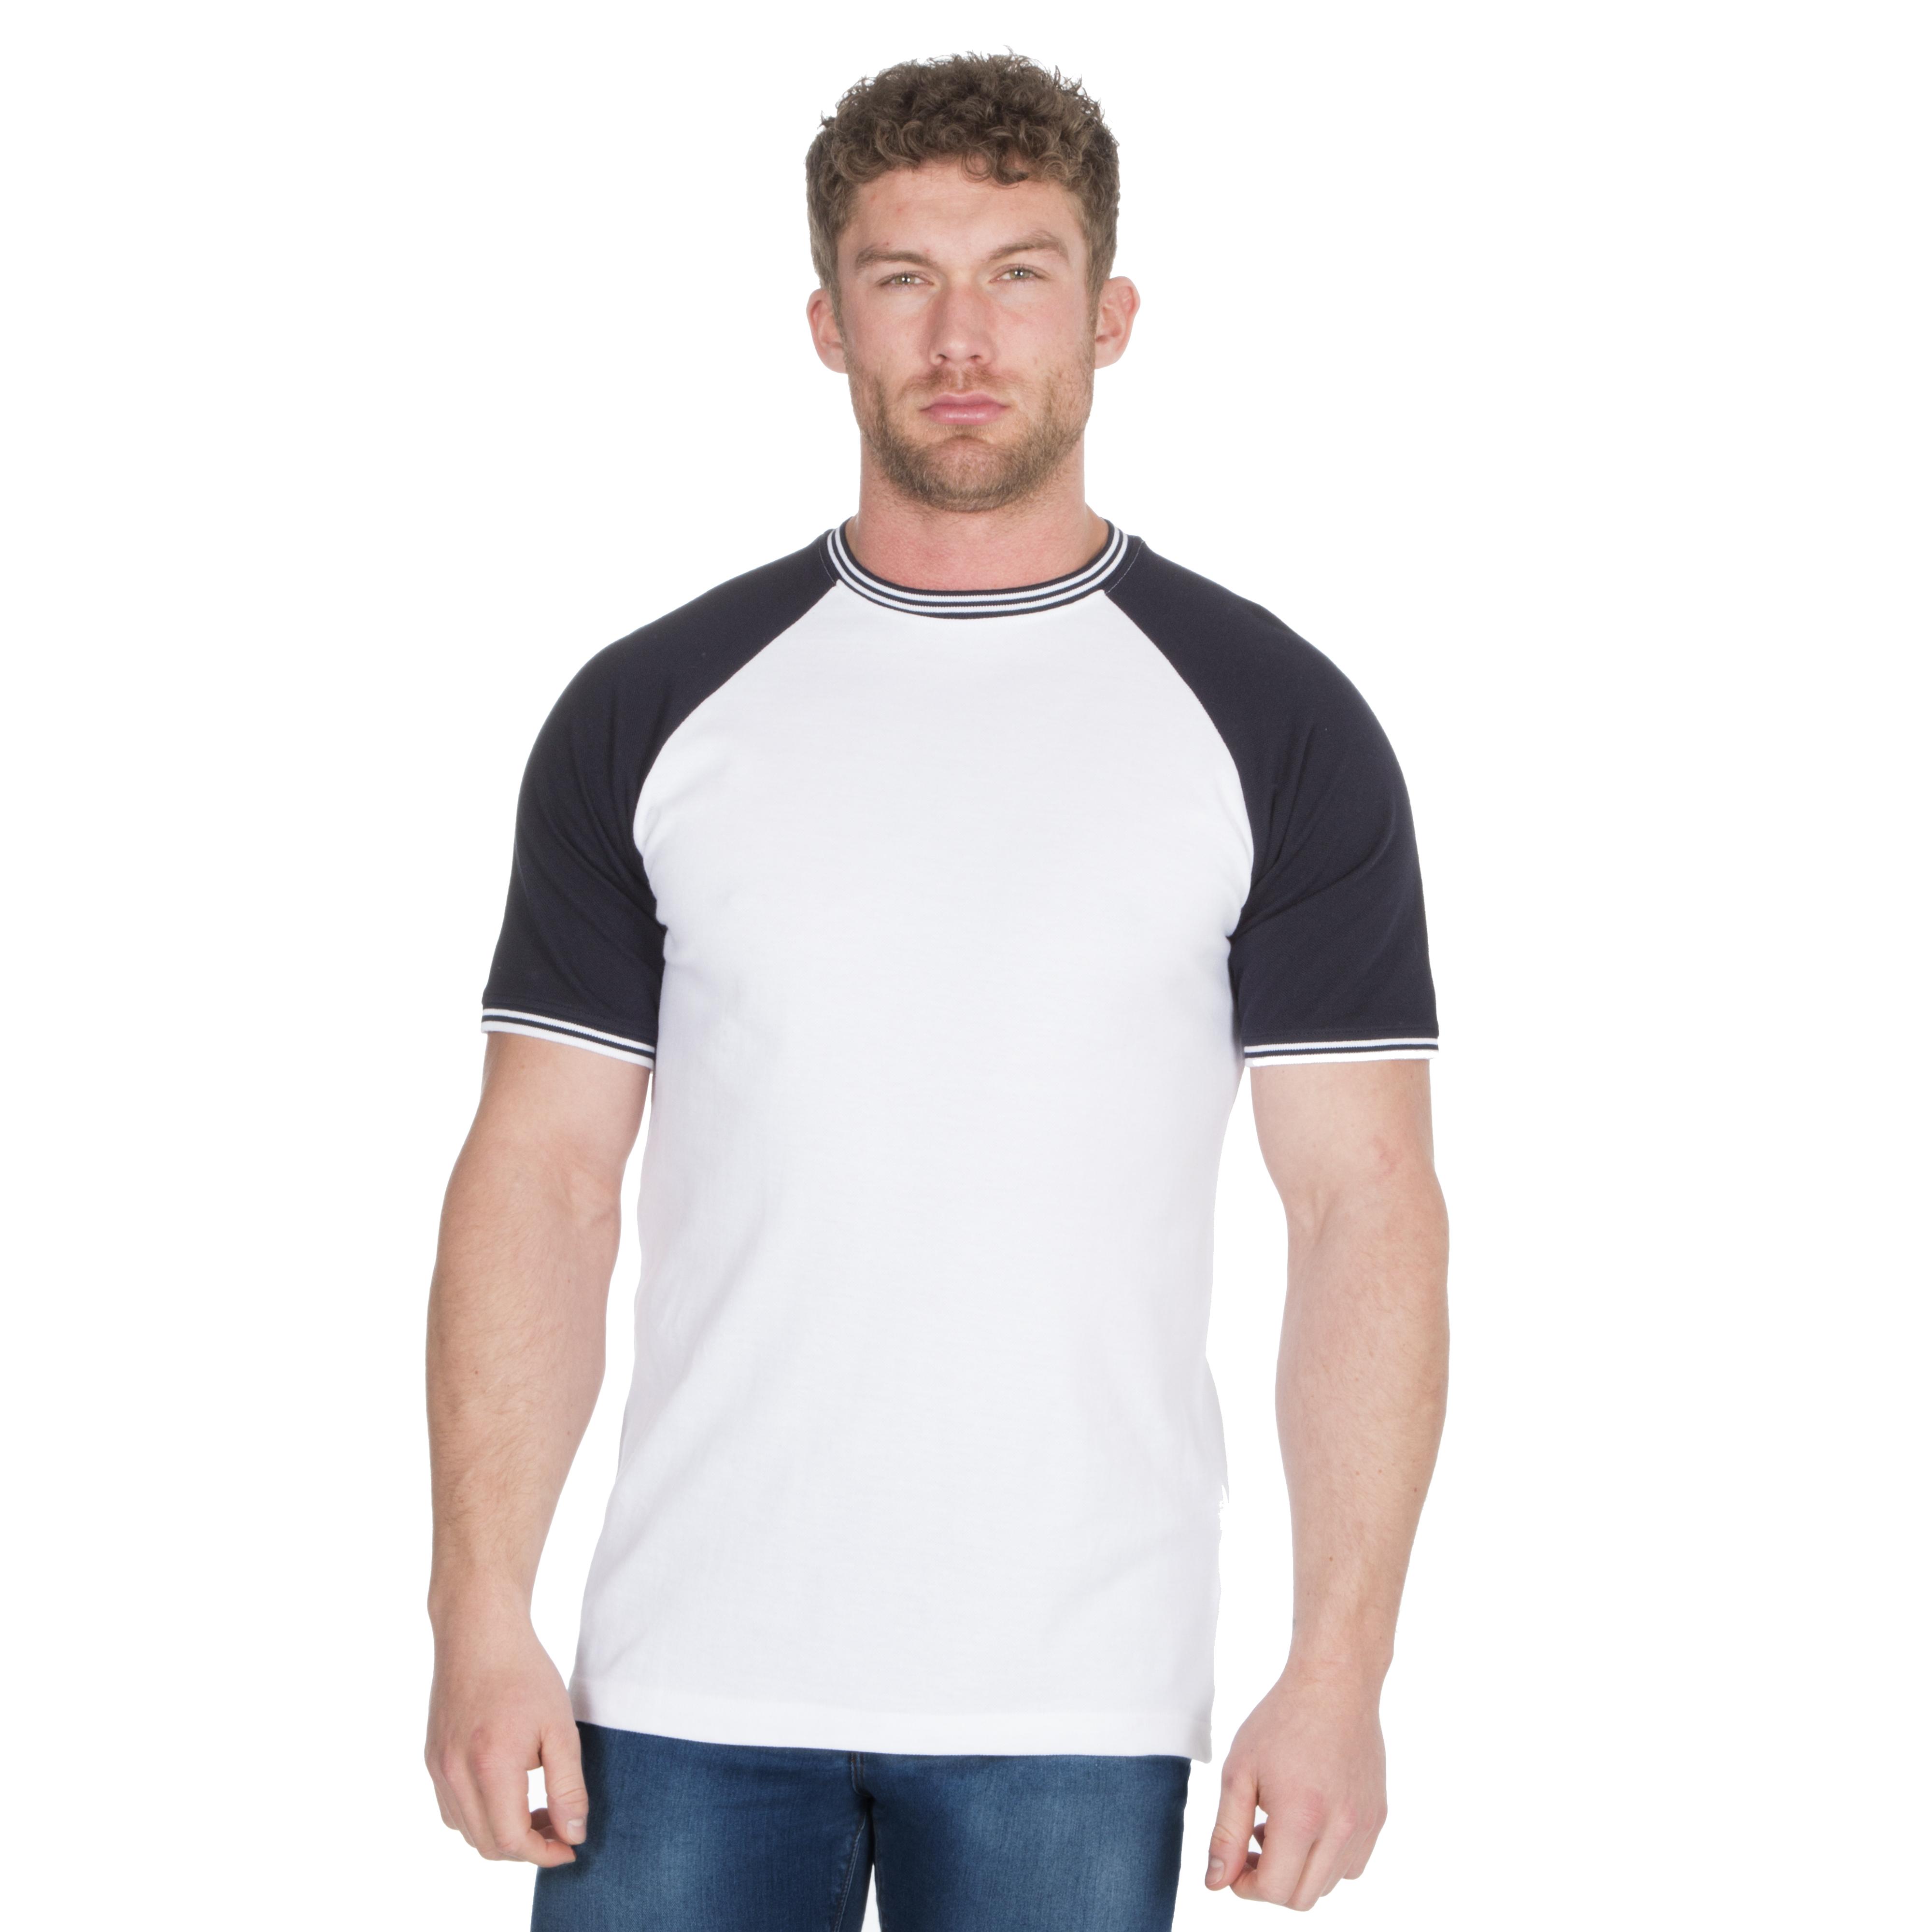 Men/'s Striped Crew Neck Short Sleeve T-Shirt Top All Sizes S-XXL